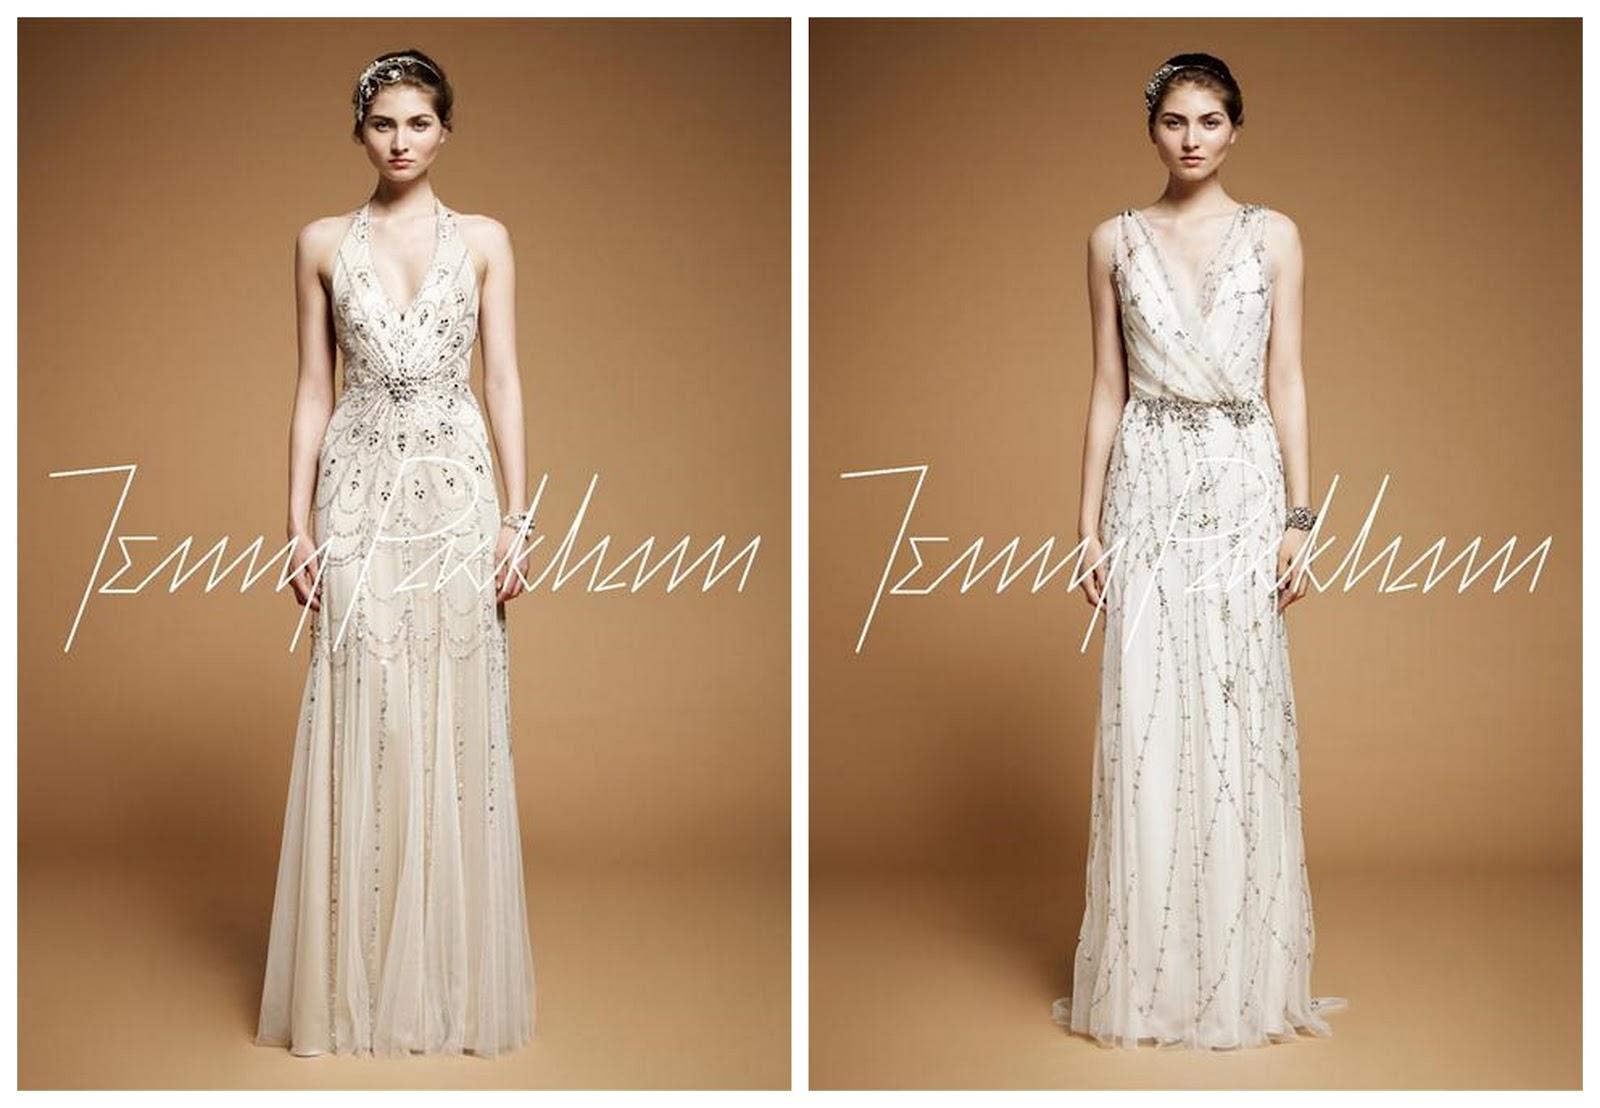 day wedding dresses | Wedding dresses 2013